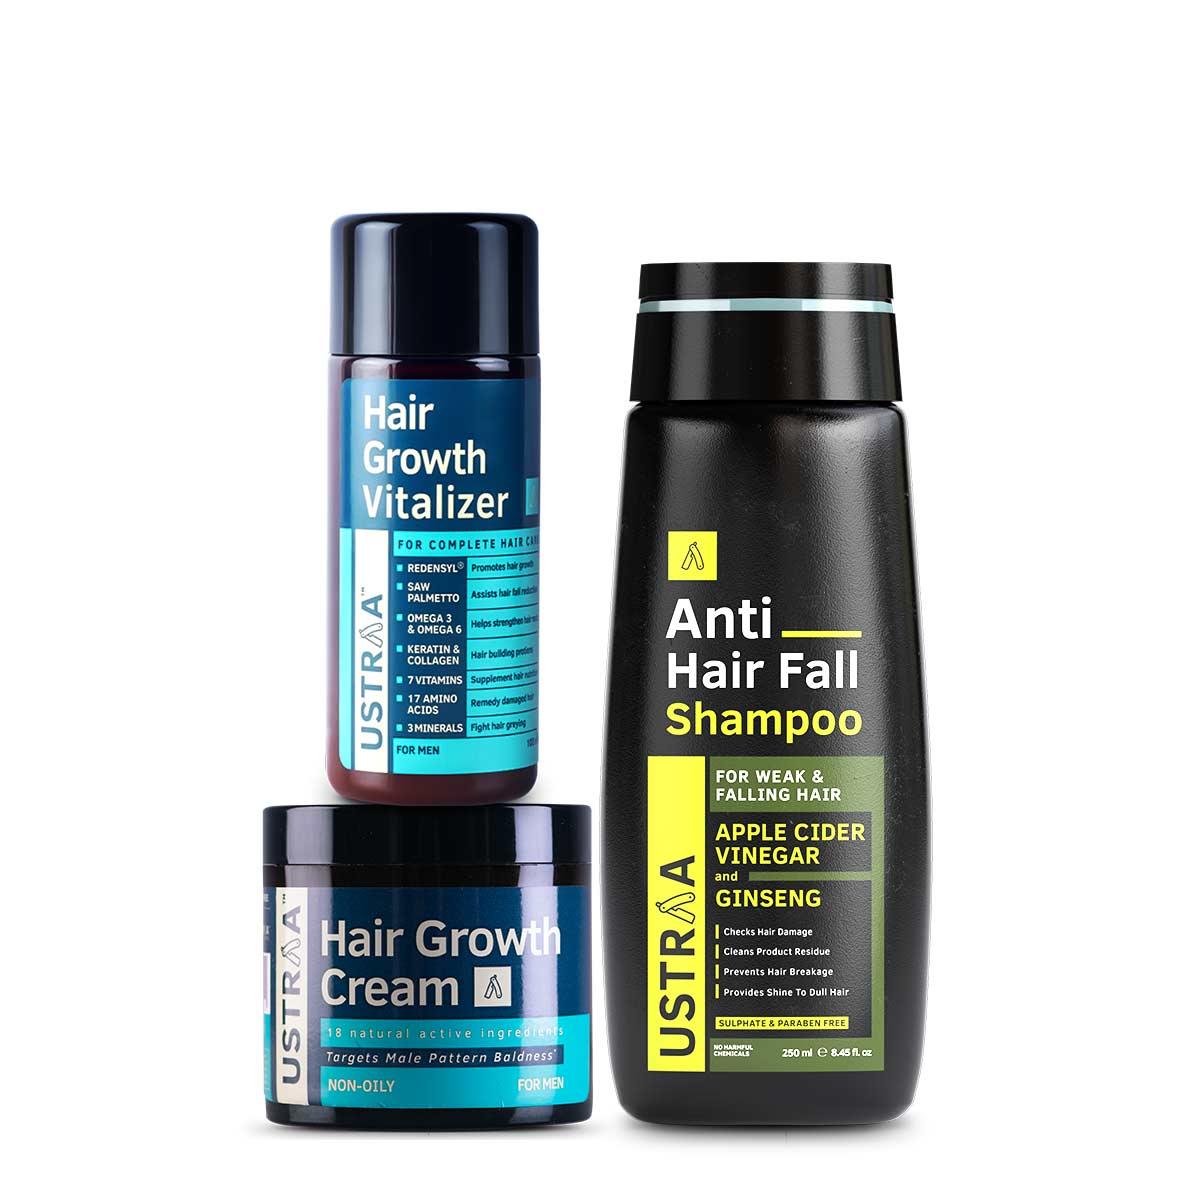 Ustraa Ultimate Hair Growth Kit for Men (Set of 3): Hair Growth Vitalizer + Hair Growth Cream + Anti-Hairfall Shampoo